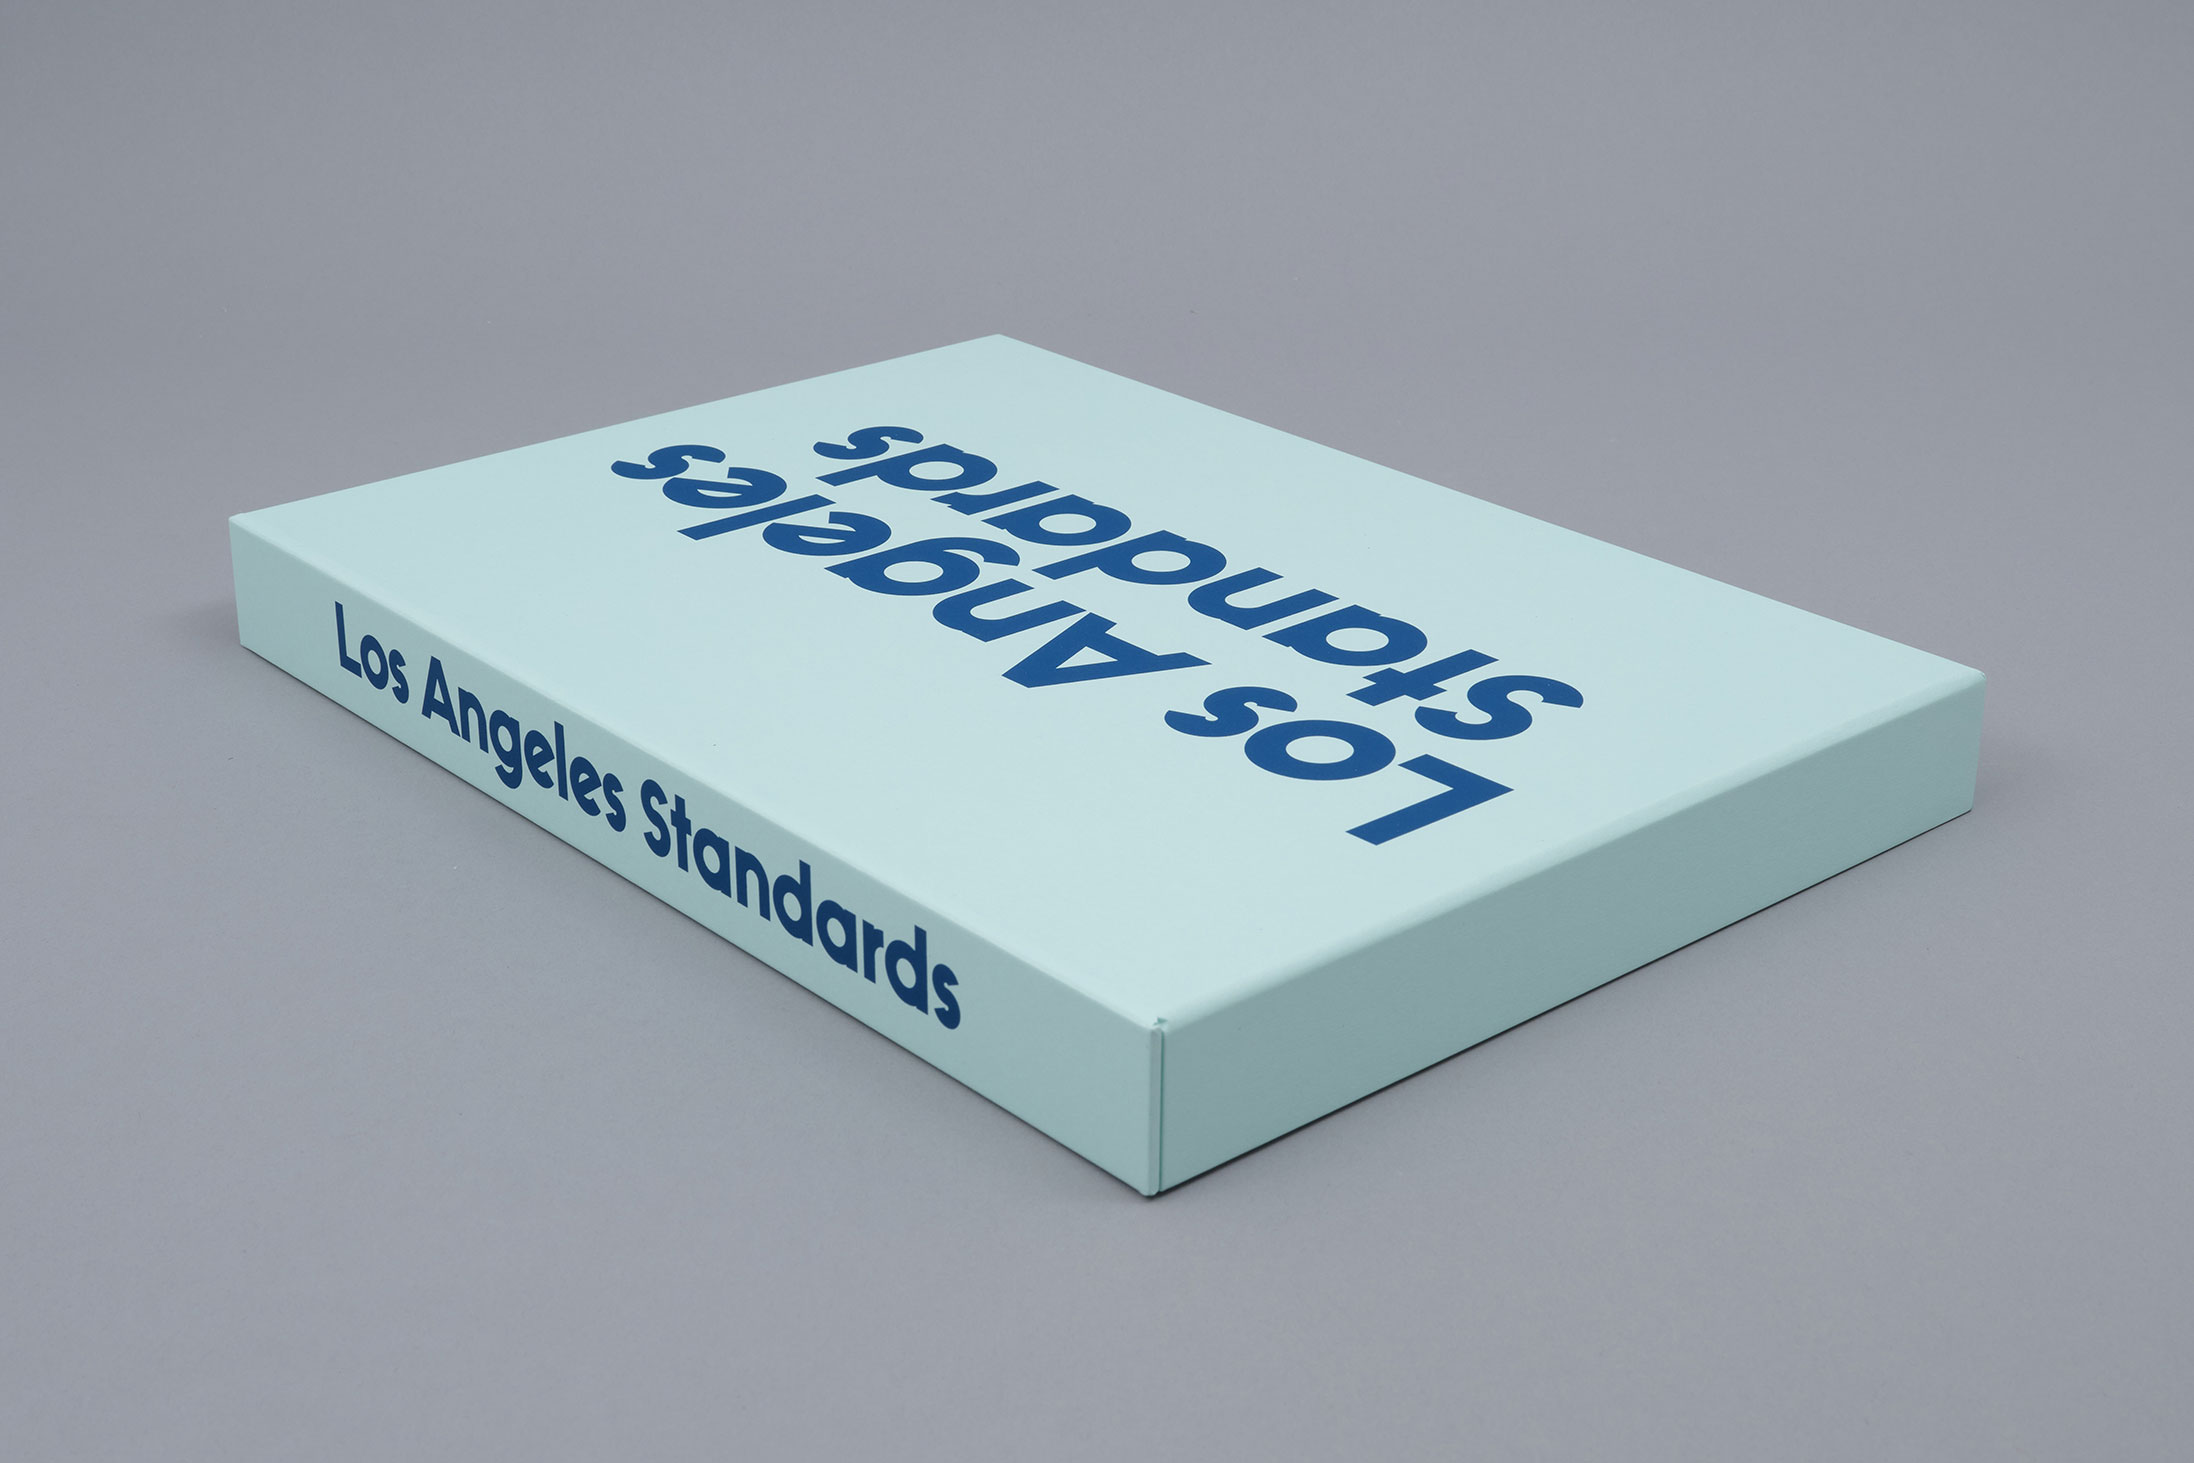 Los-angeles-standards-portfolio-delpire-1w